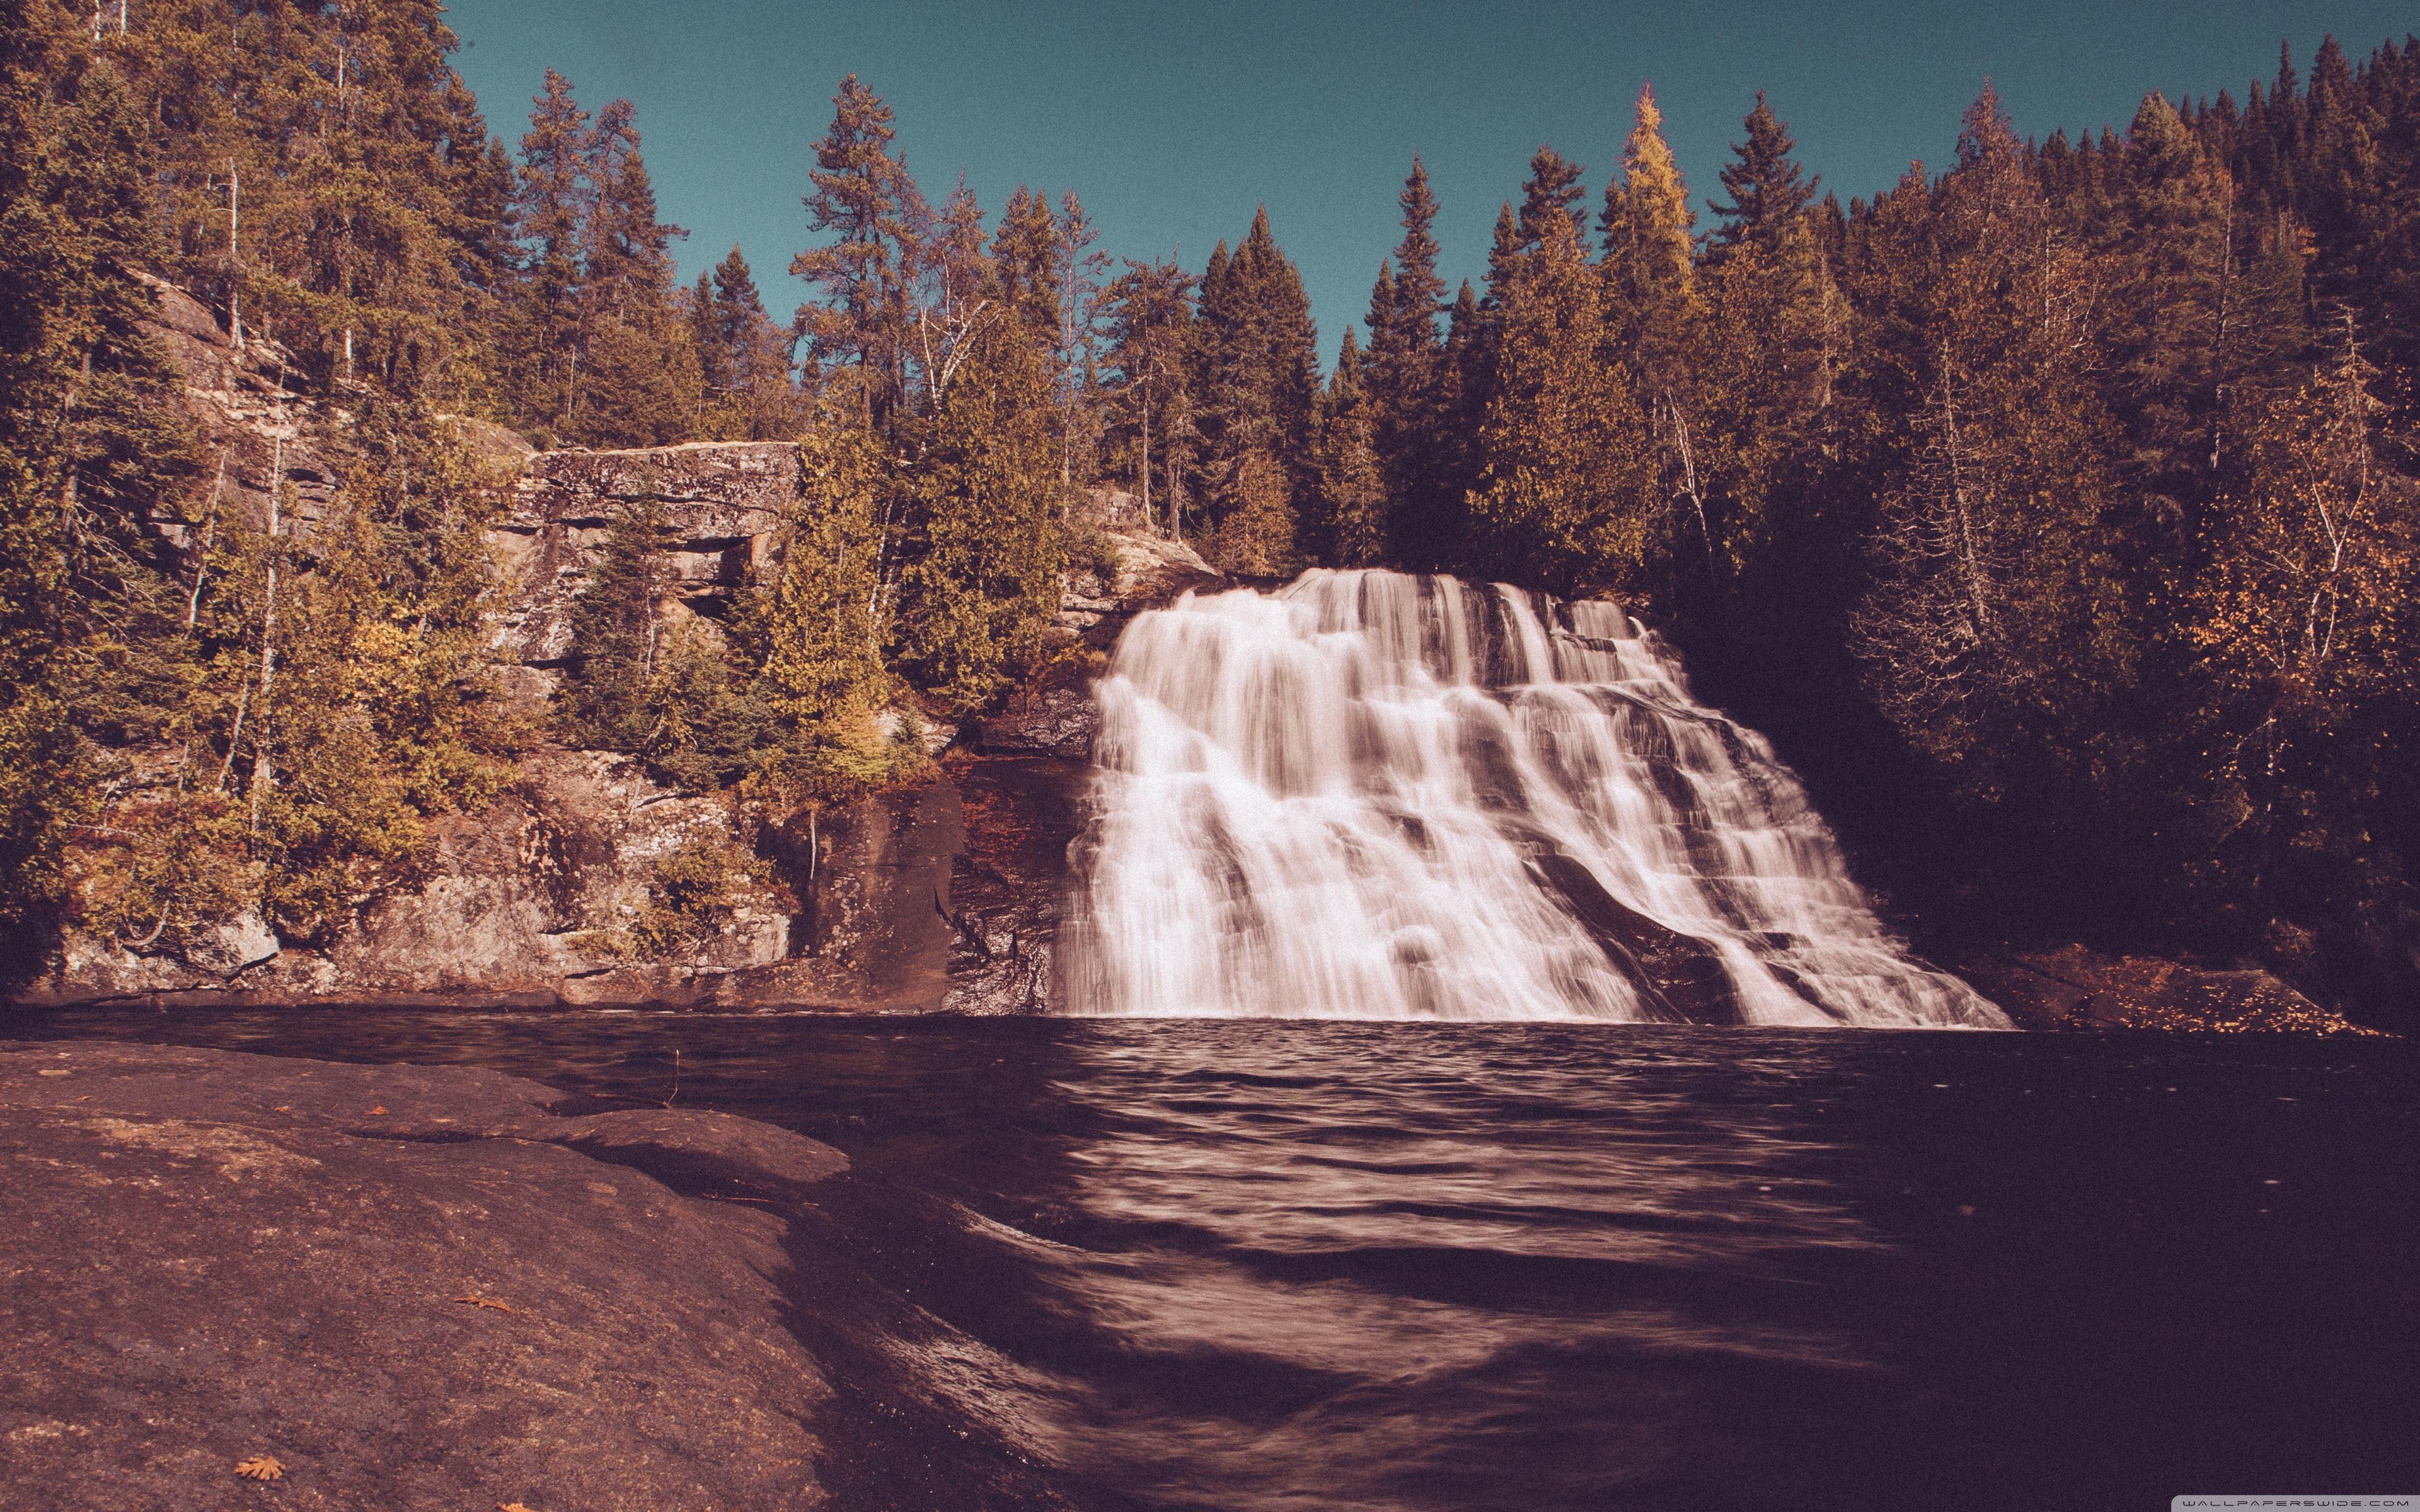 vintage_waterfall_forest-wallpaper-3840x2400.jpg